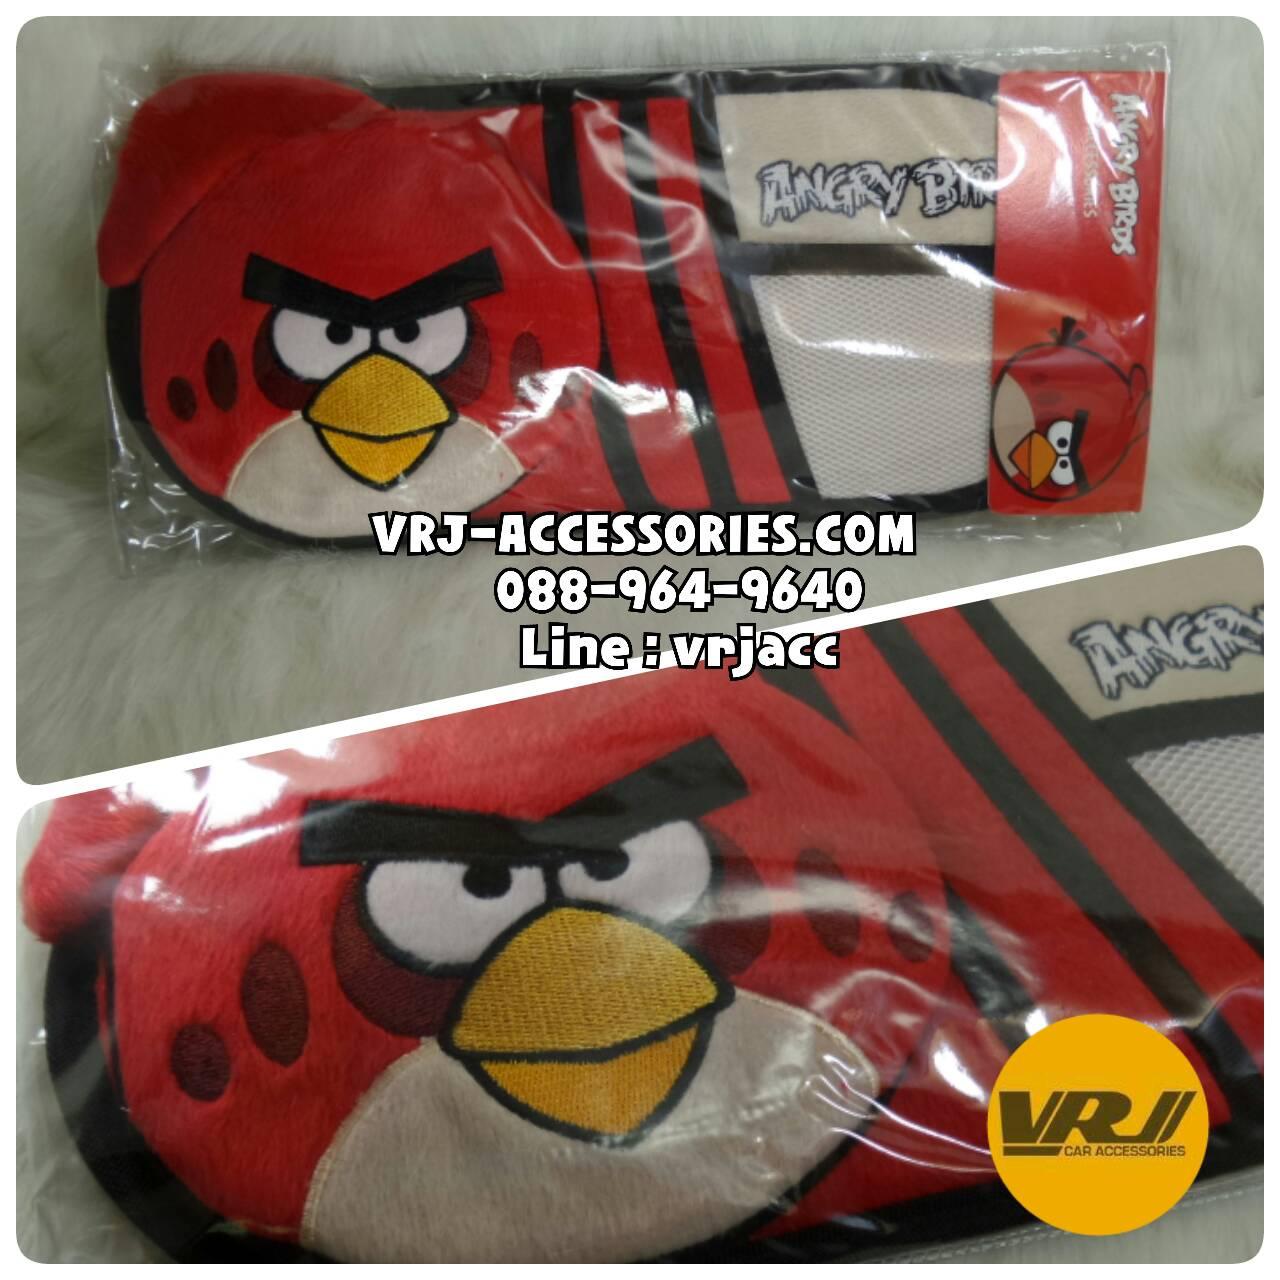 Vj1096 ที่ใส่ซีดีตรงที่บังแดด ลายแองกรี้ เบิรด์: CD Sun visor pocket – Angry Bird